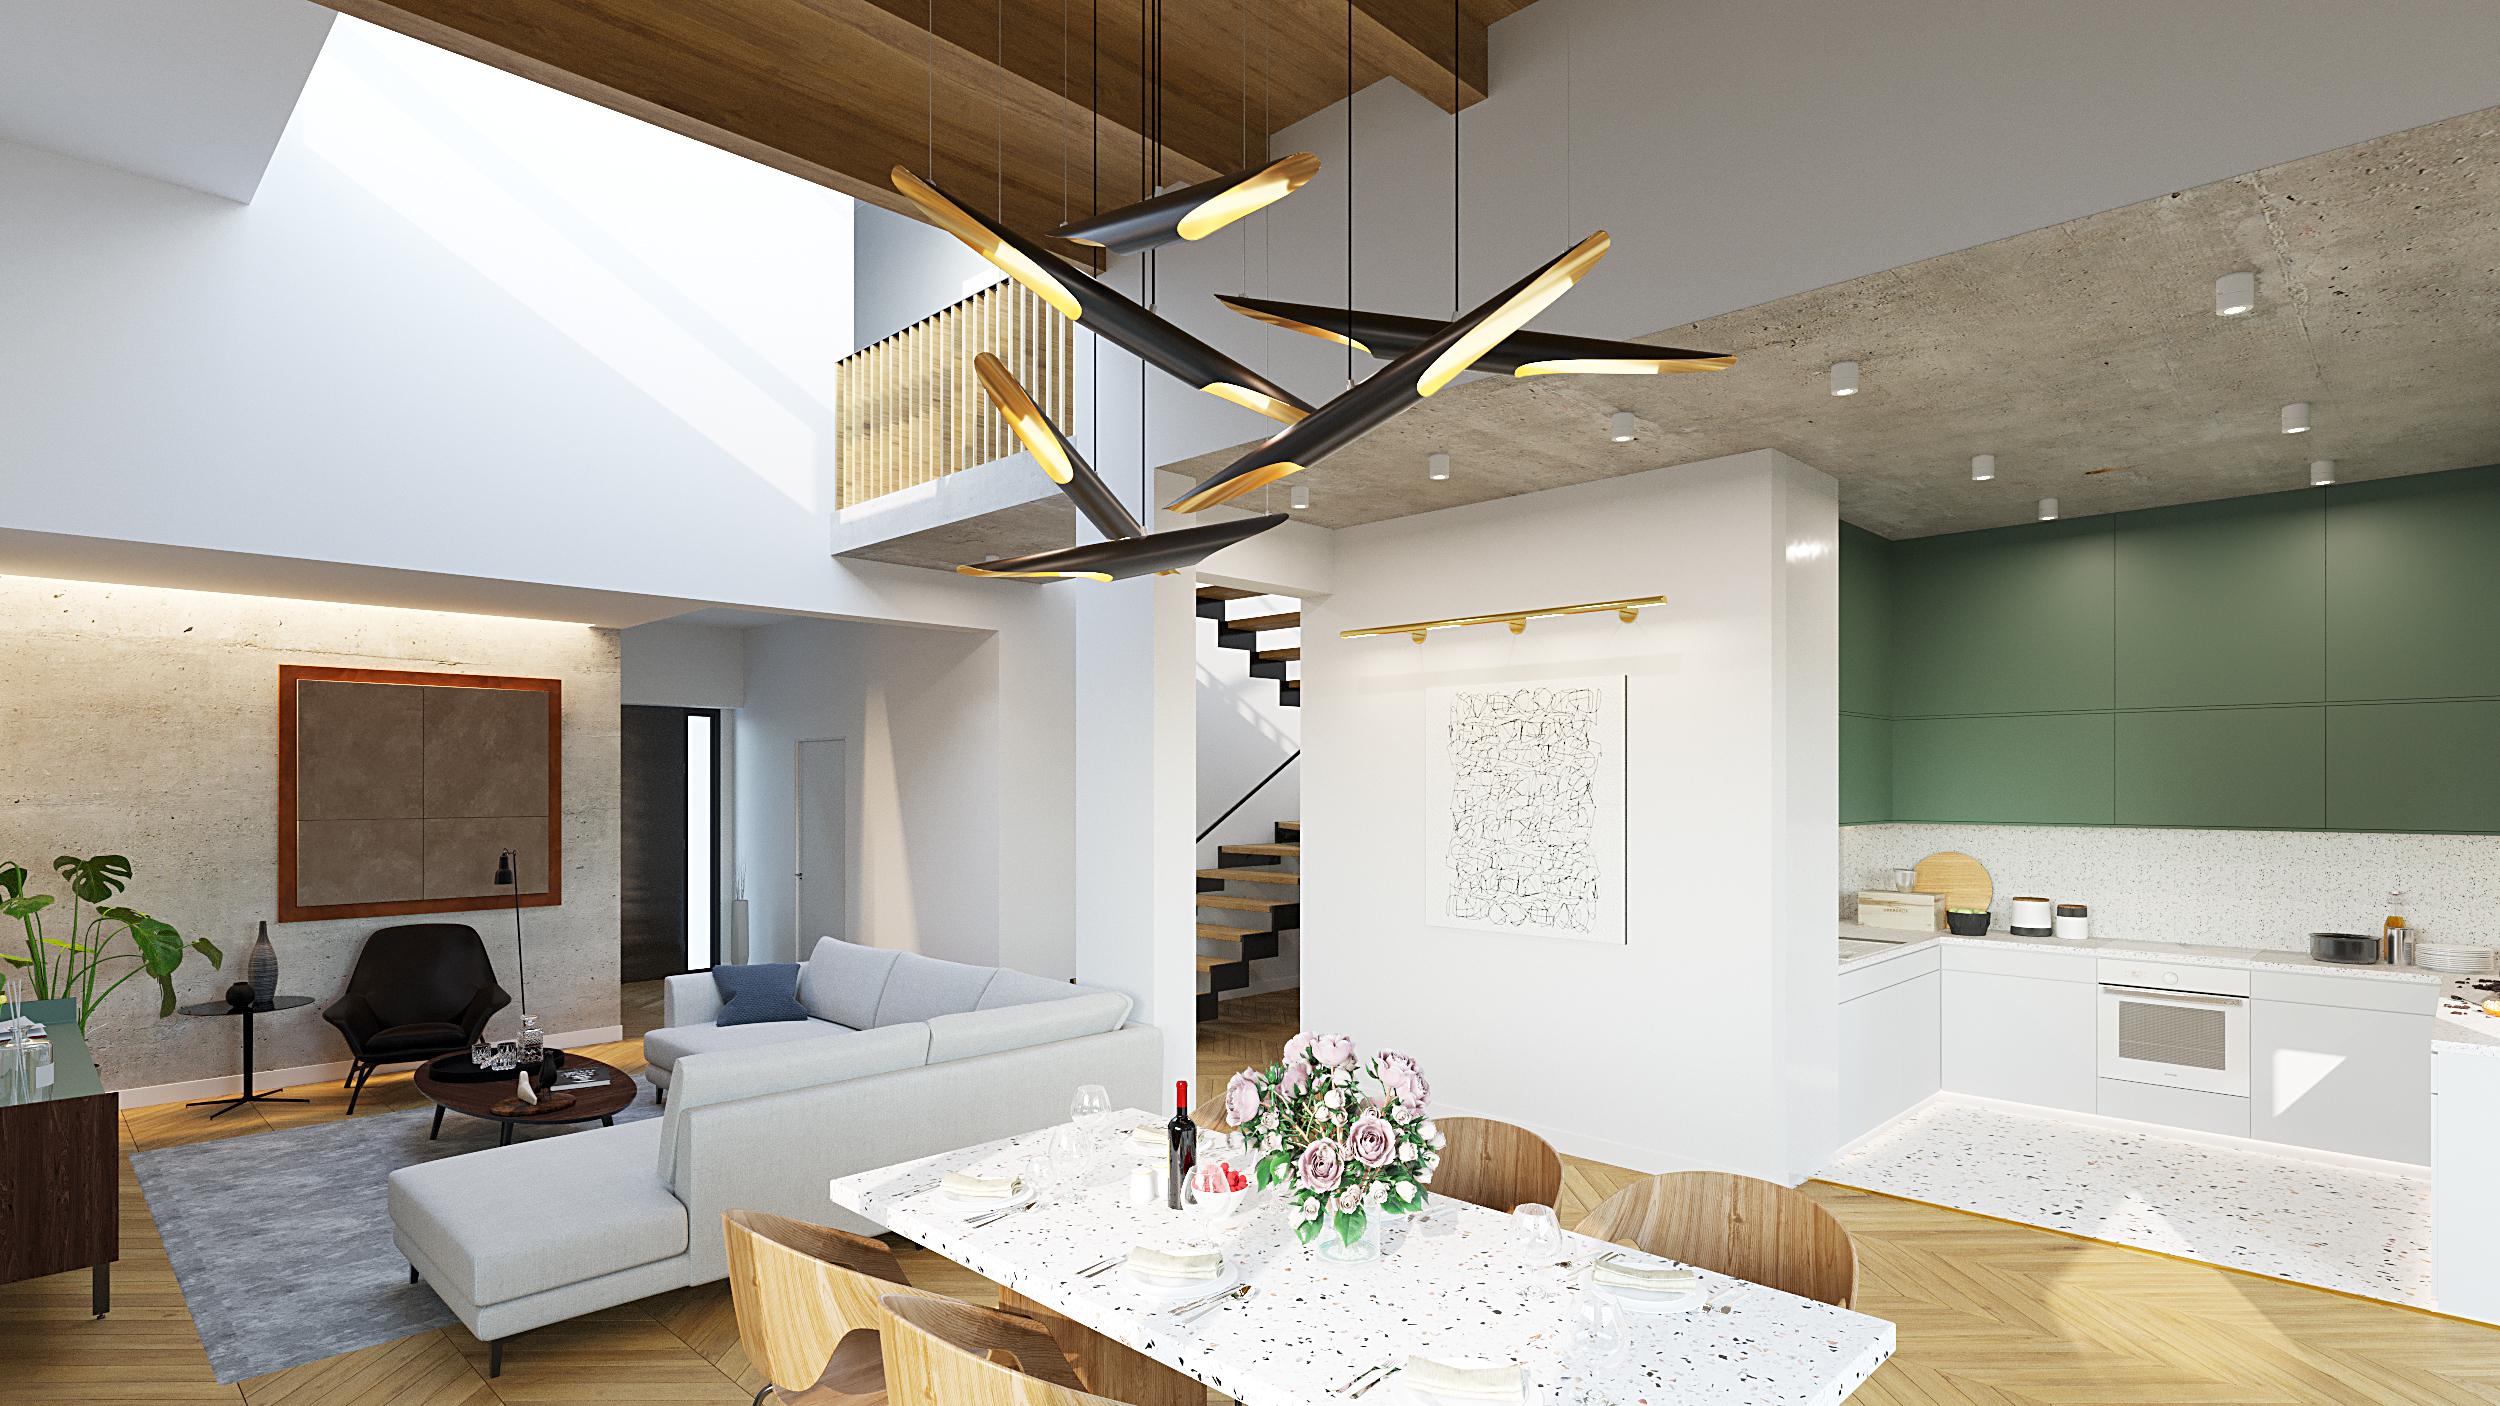 https://nbc-arhitect.ro/wp-content/uploads/2020/10/NBC-Arhitect-_-residential-_-Grand-Home-Residence-_-Romania_8.jpg